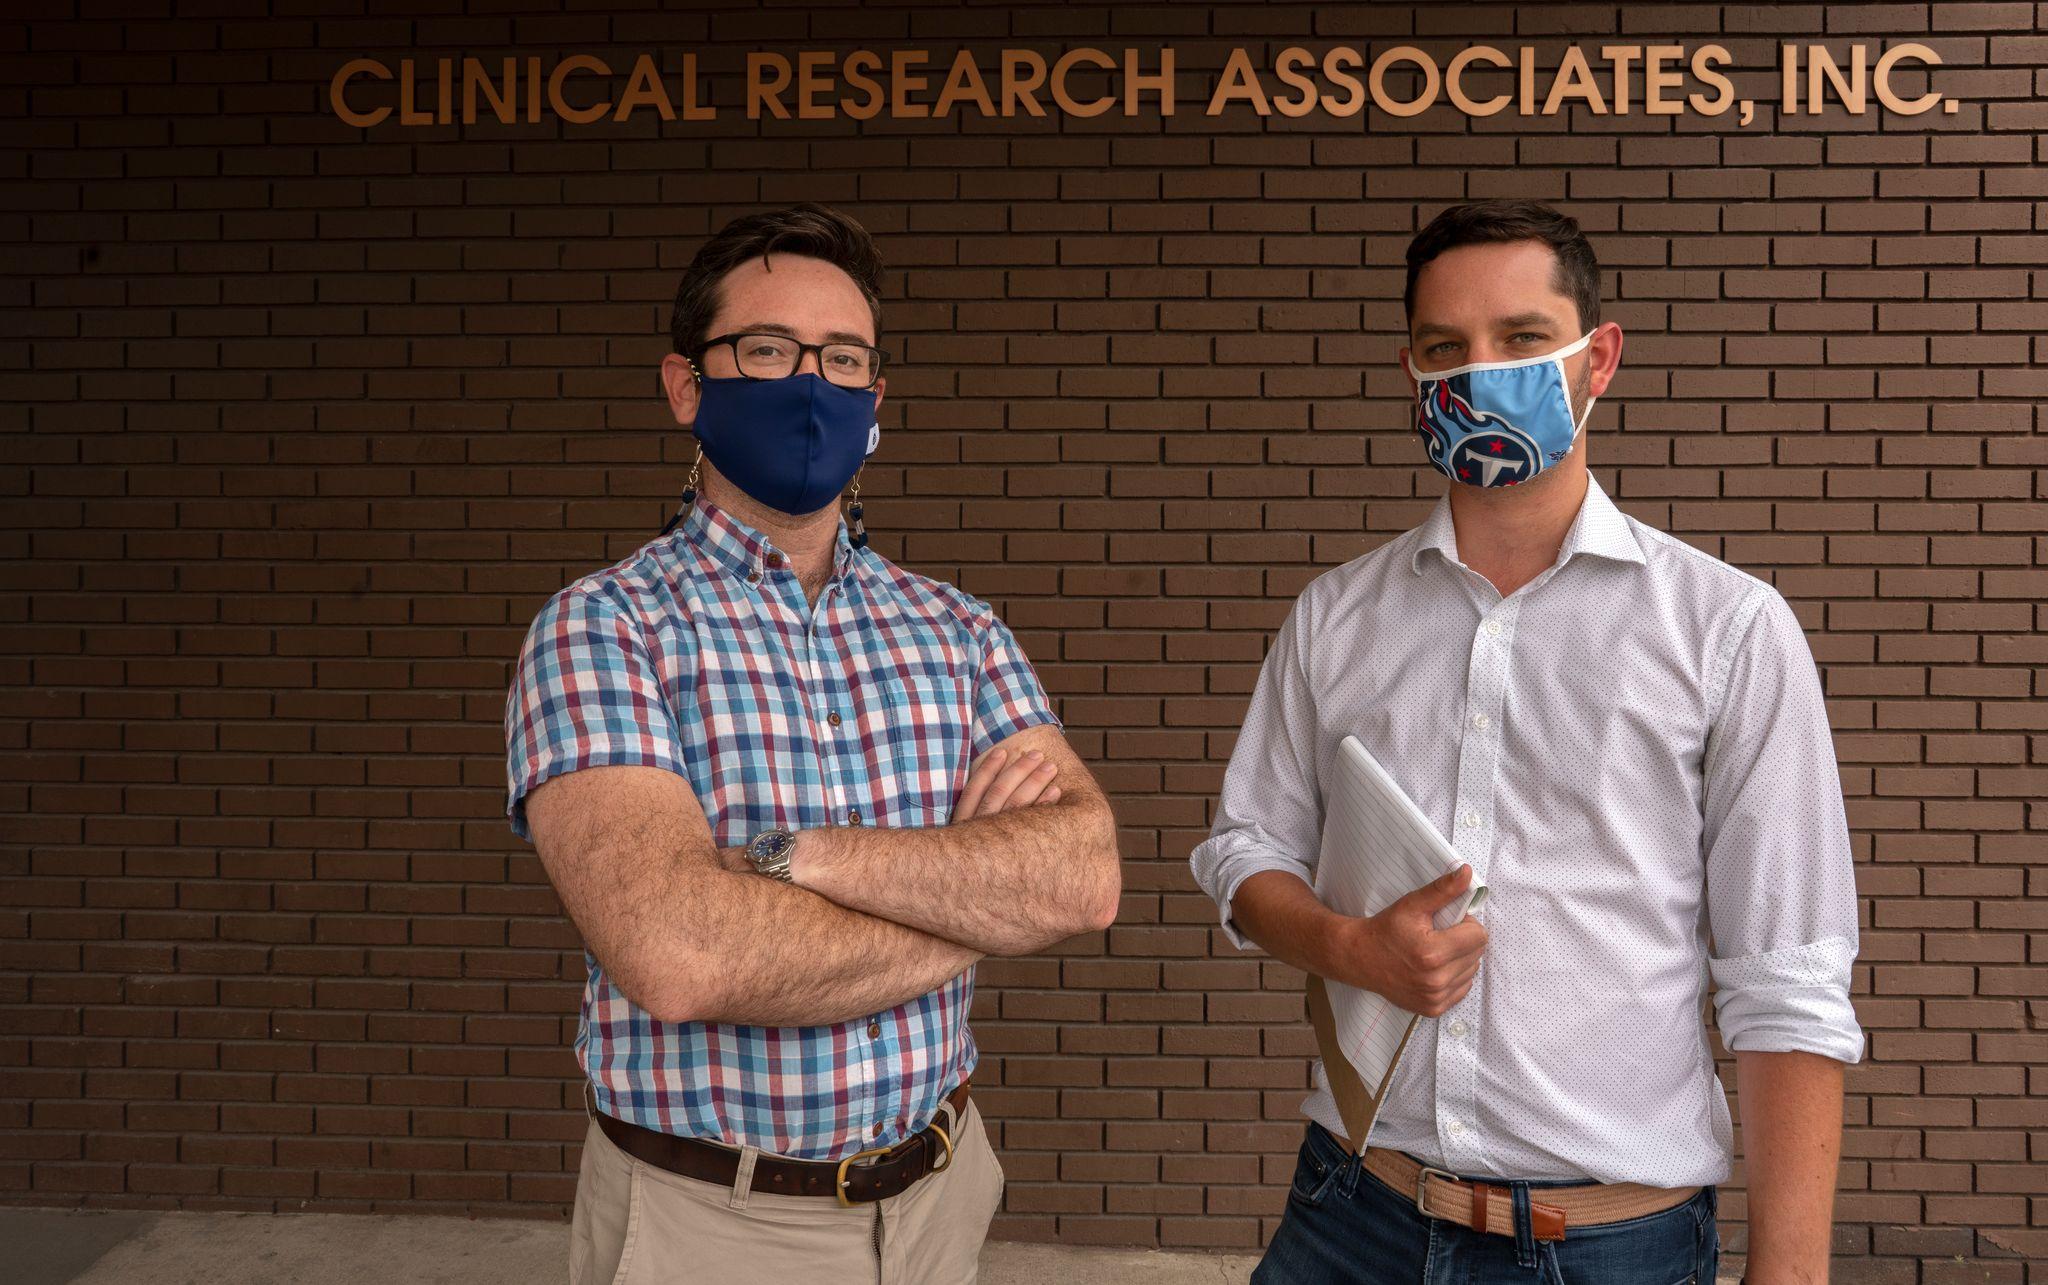 Matthew Schipani and Will Krugman with Clinical Research Associates. (Photo: John Partipilo)